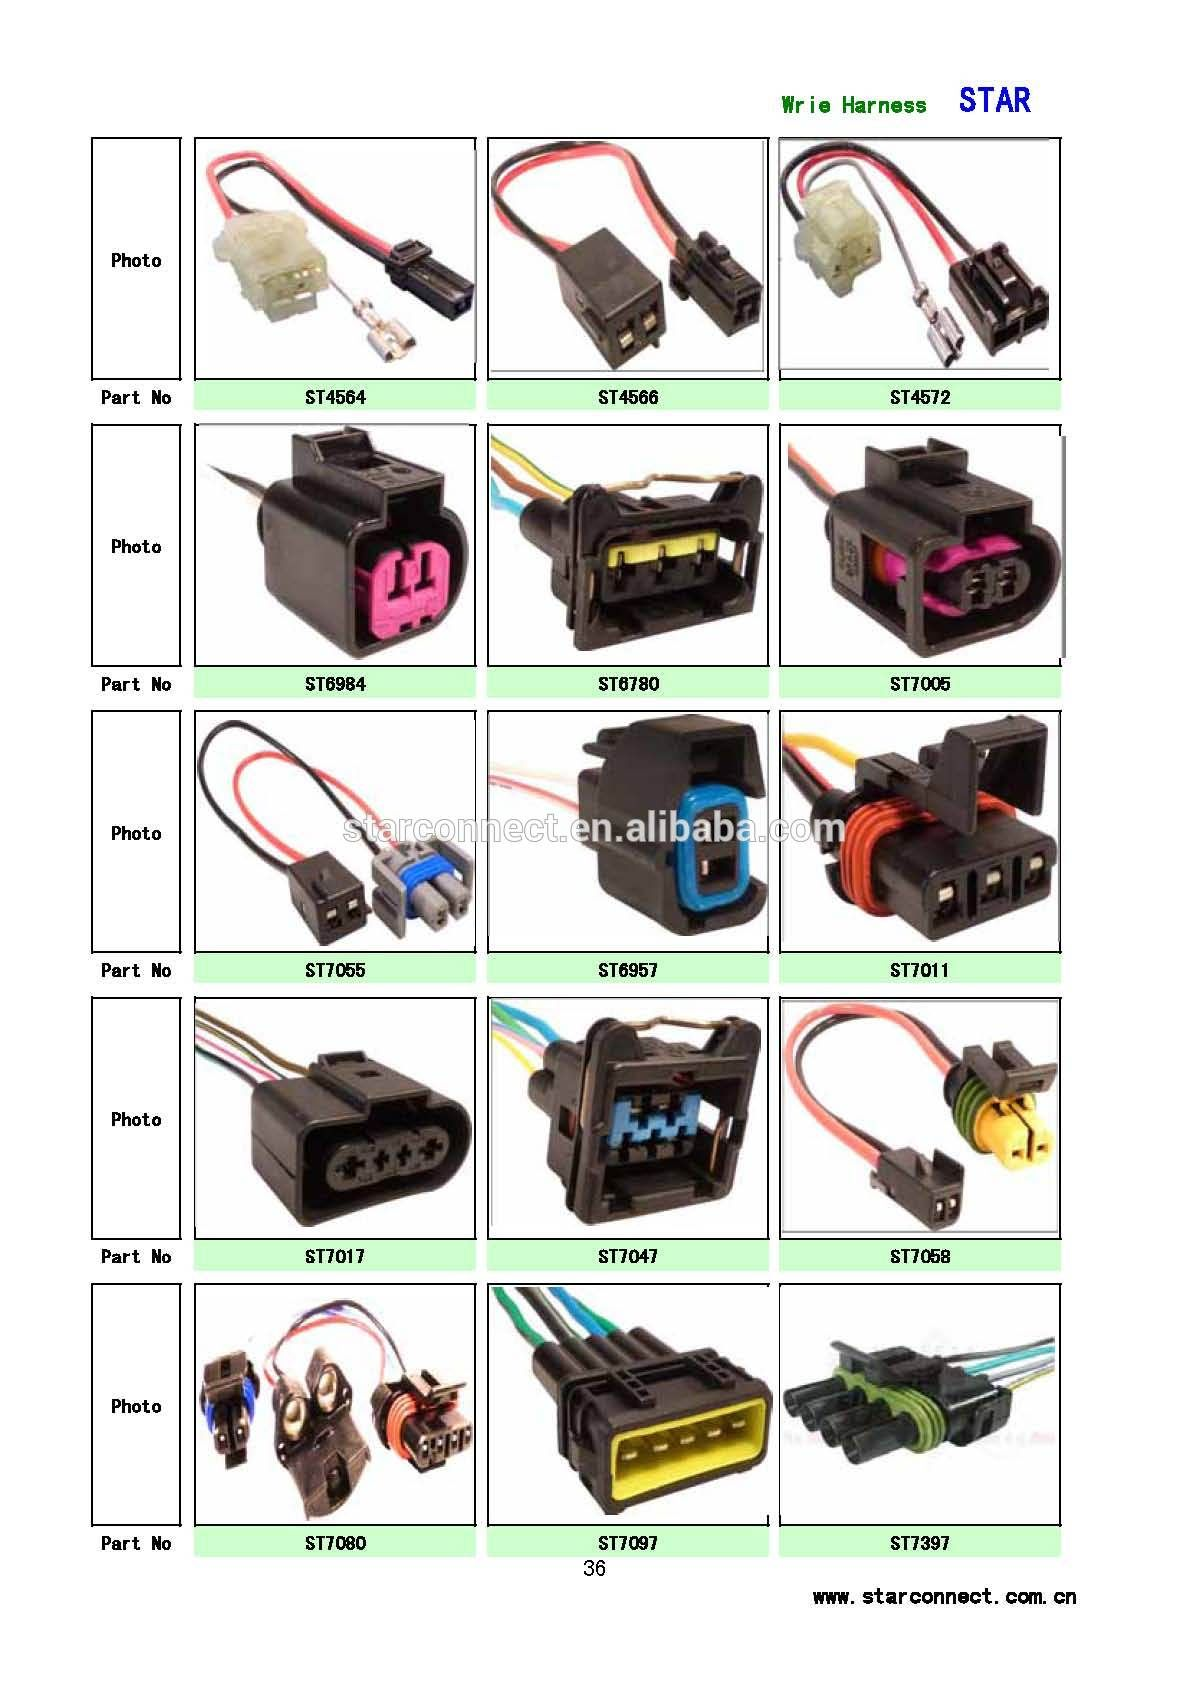 Deutsch Automotive Dt Connector Car Audio Systems Diy Security Cameras For Home Car Audio Systems